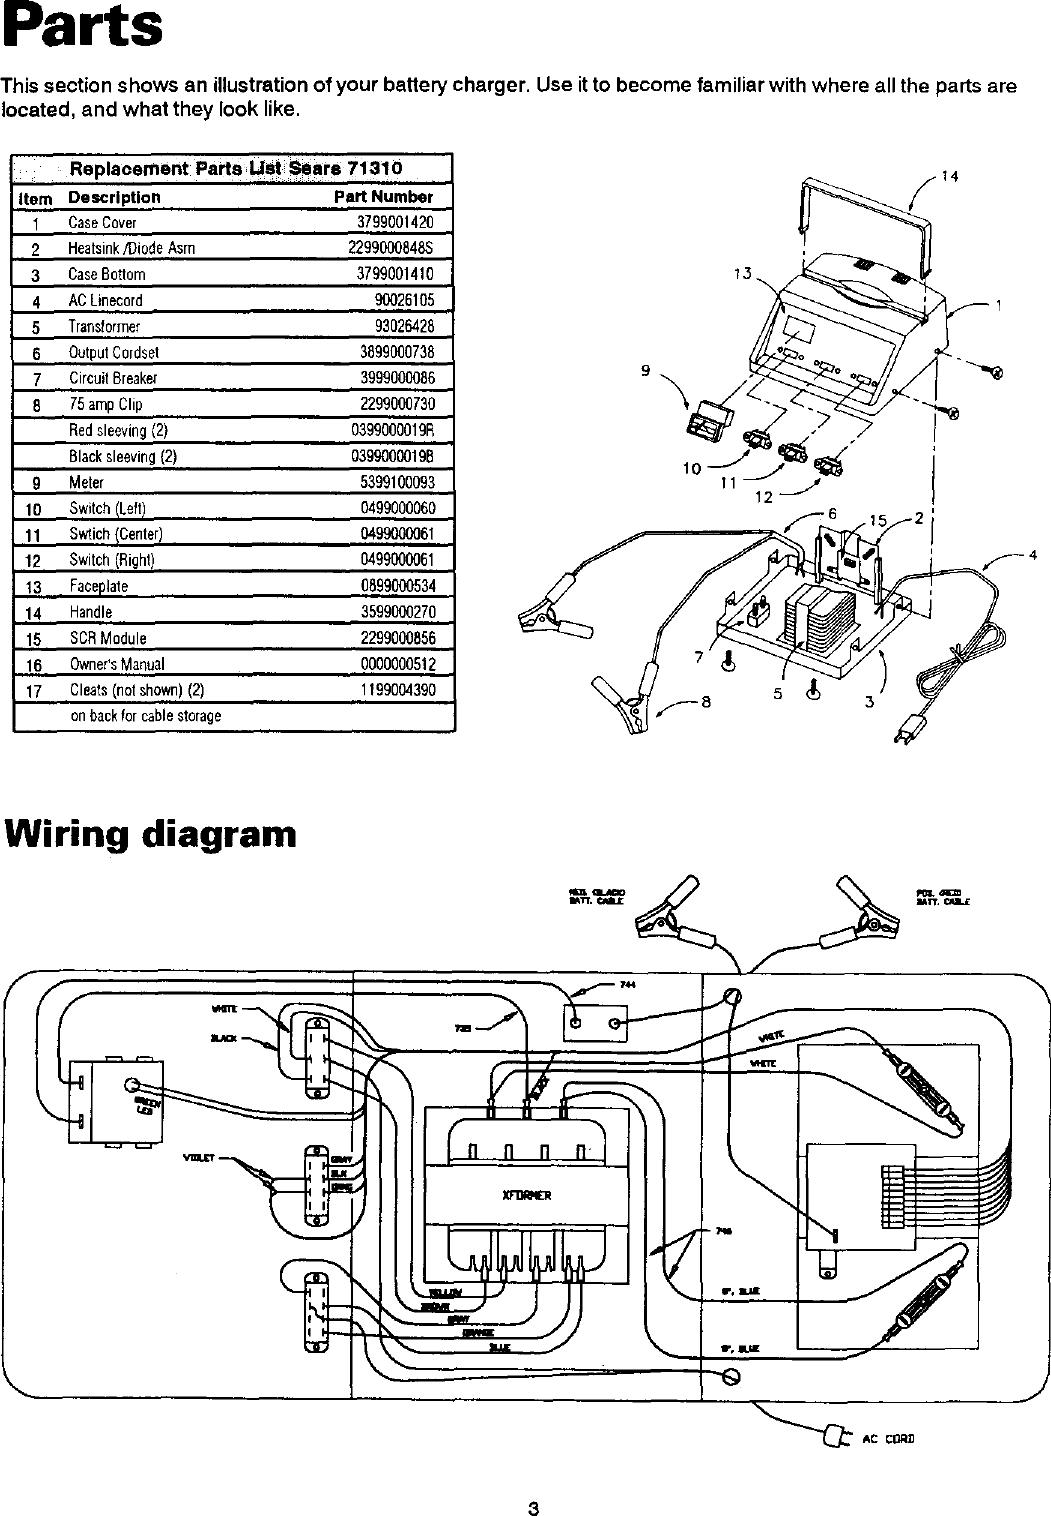 TB_3499] Diehard Battery Charger Wiring Diagram Wiring DiagramIfica Bedr Monoc Majo Umize Penghe Isra Mohammedshrine Librar Wiring 101